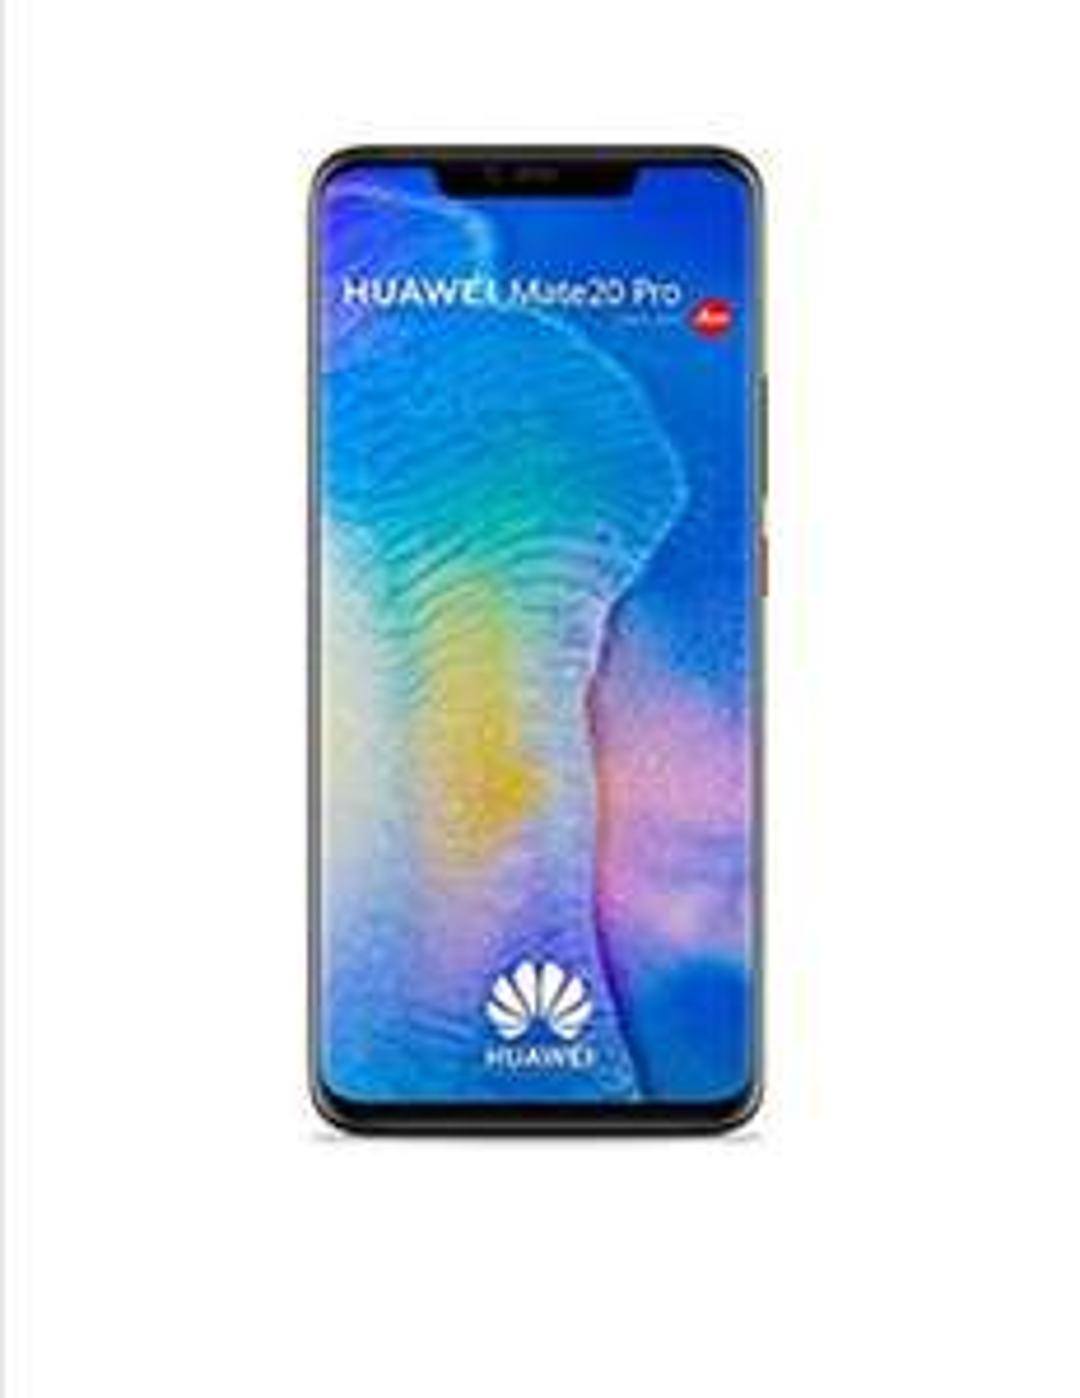 Huawei Mate20 Pro 128 GB/6 GB Single SIM Smartphone - Black (West European Version)